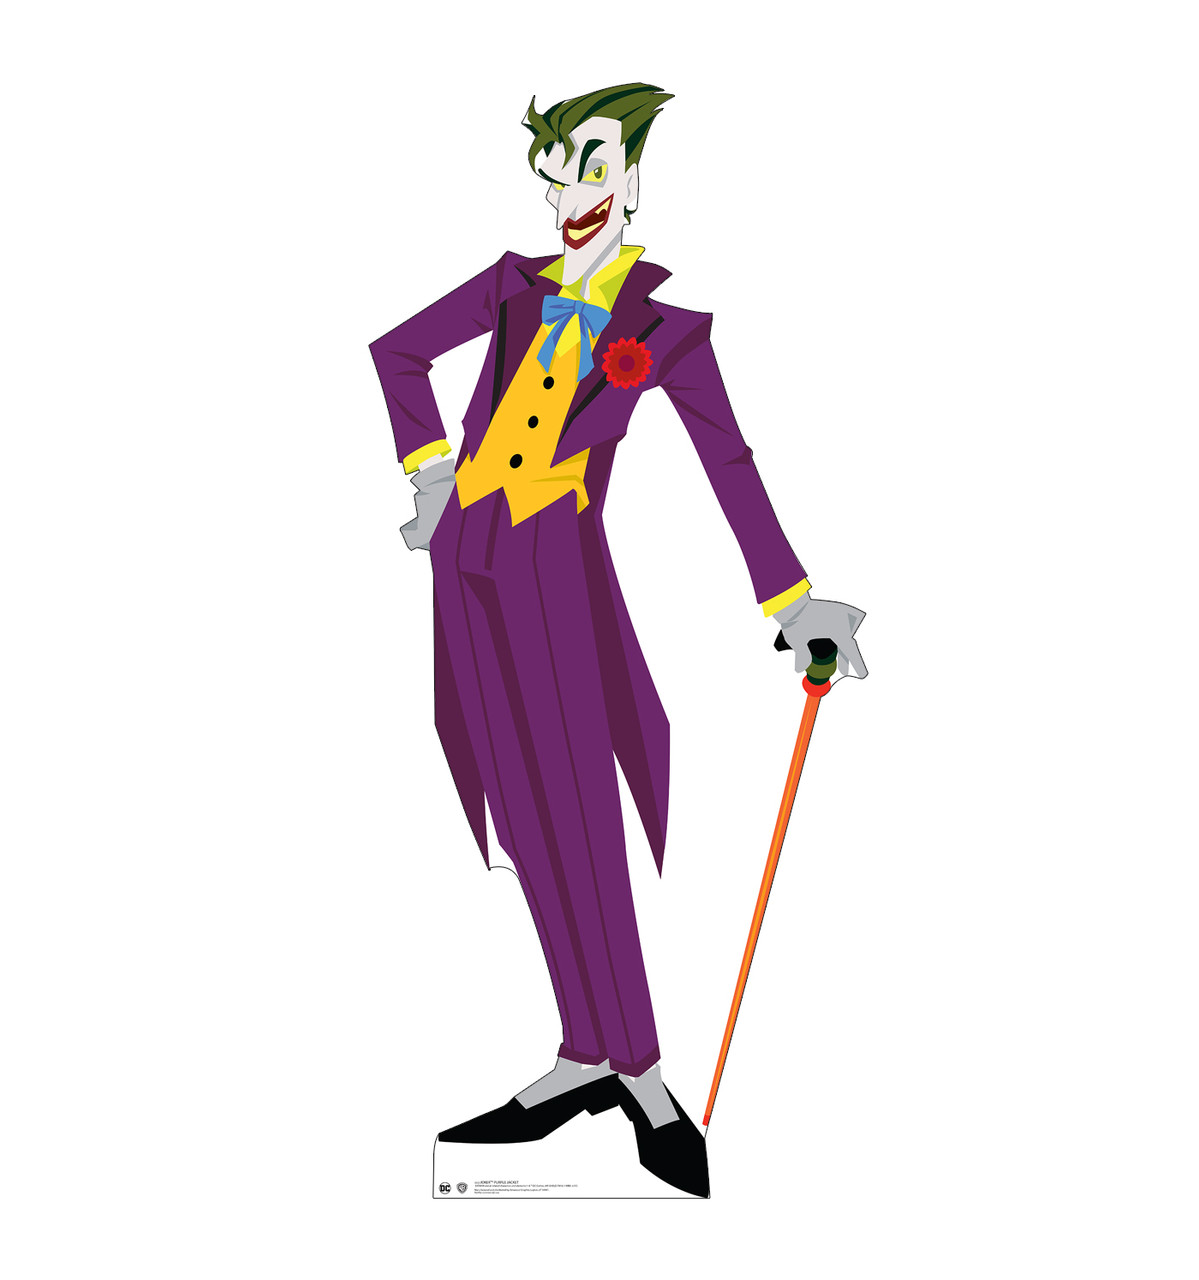 Life-size cardboard standee of The Joker in a purple suit.